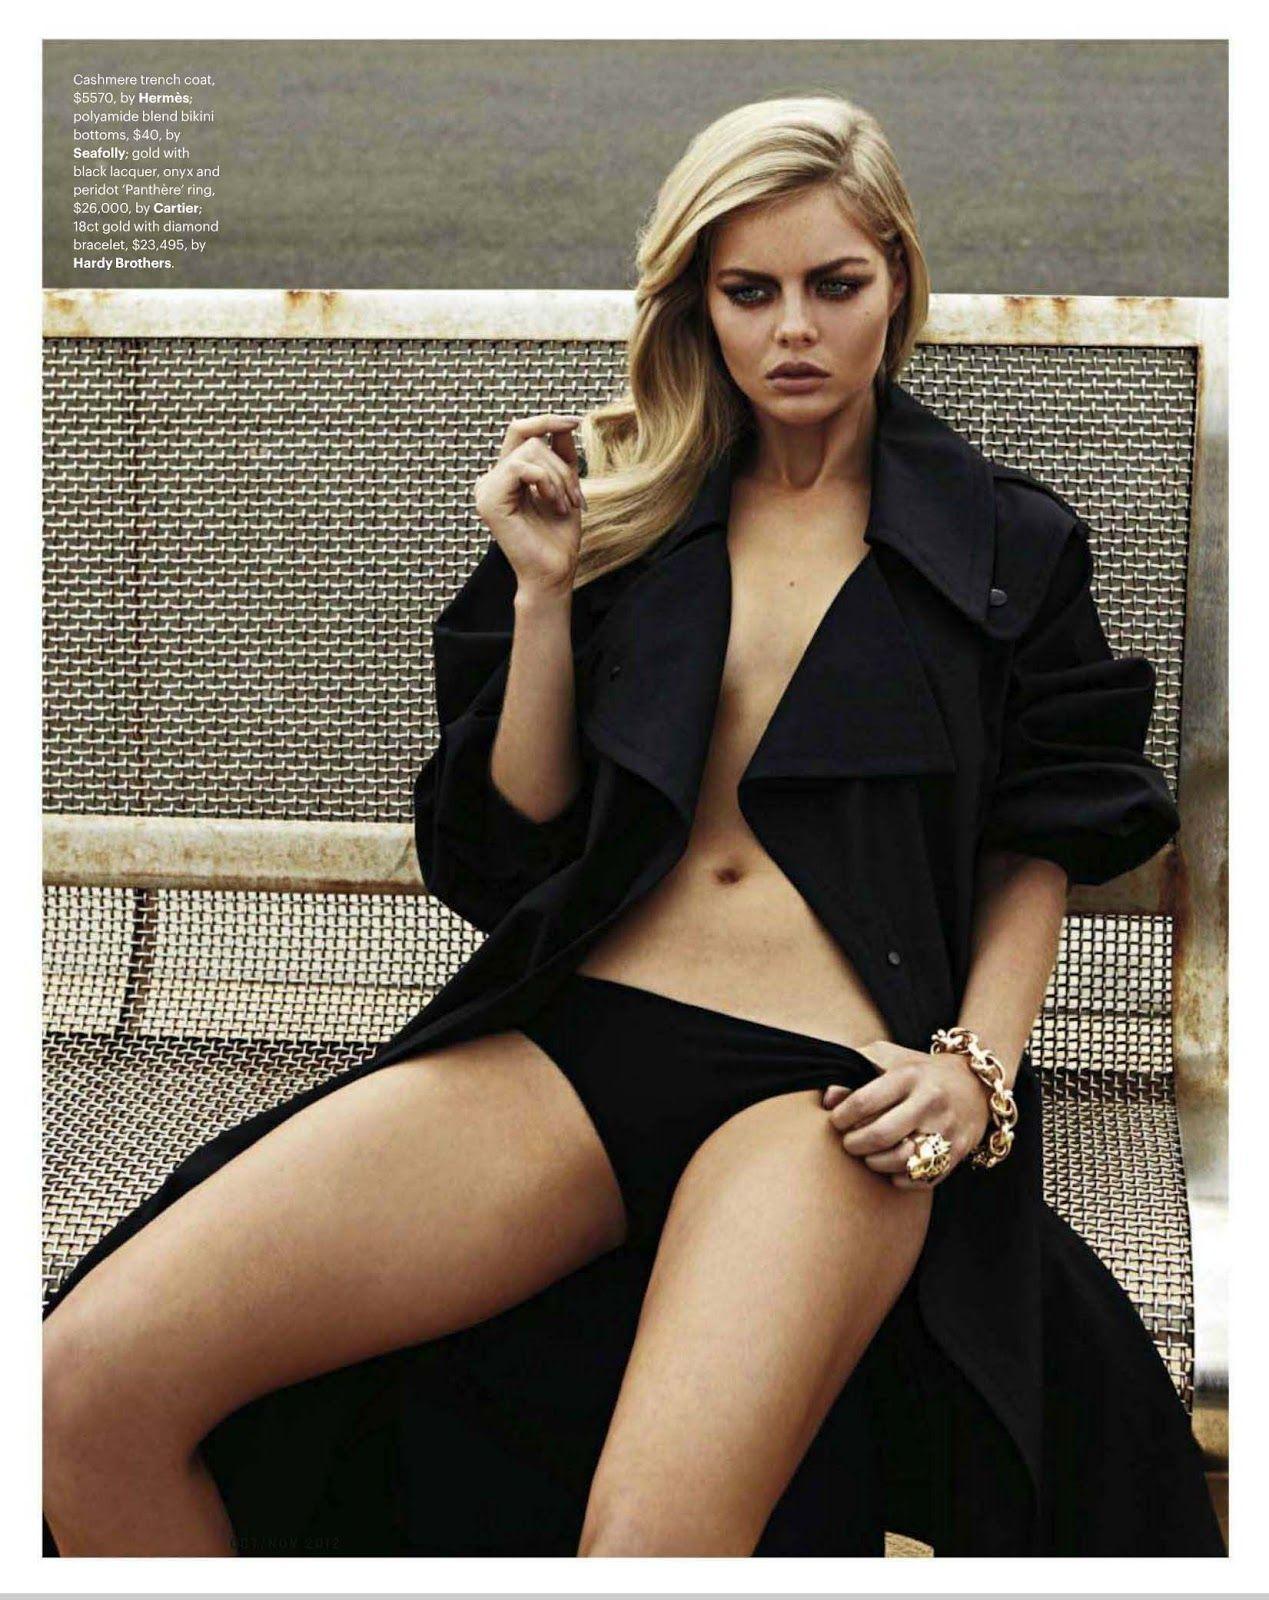 Cleavage Samara Weaving nudes (89 photos), Topless, Is a cute, Feet, braless 2020